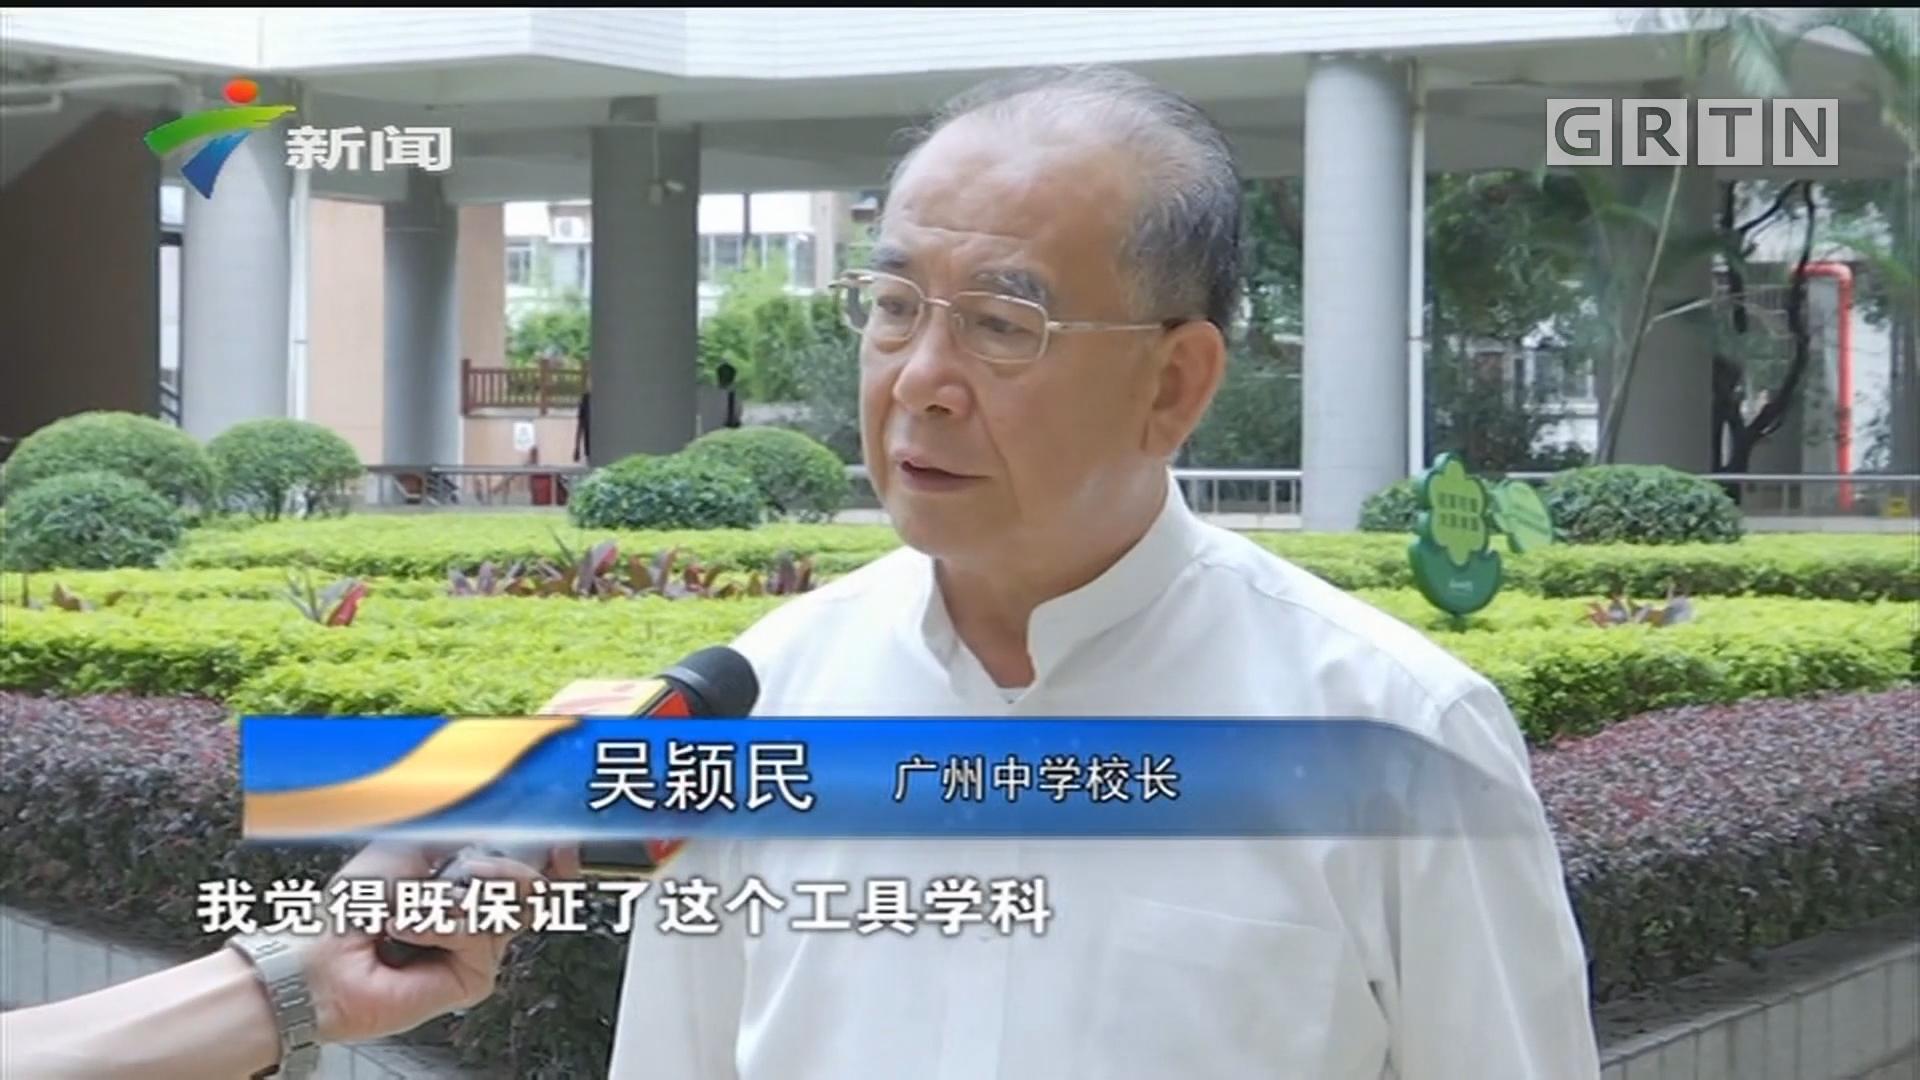 [HD][2019-06-23]權威訪談:廣東:推進高考改革 公平科學選才